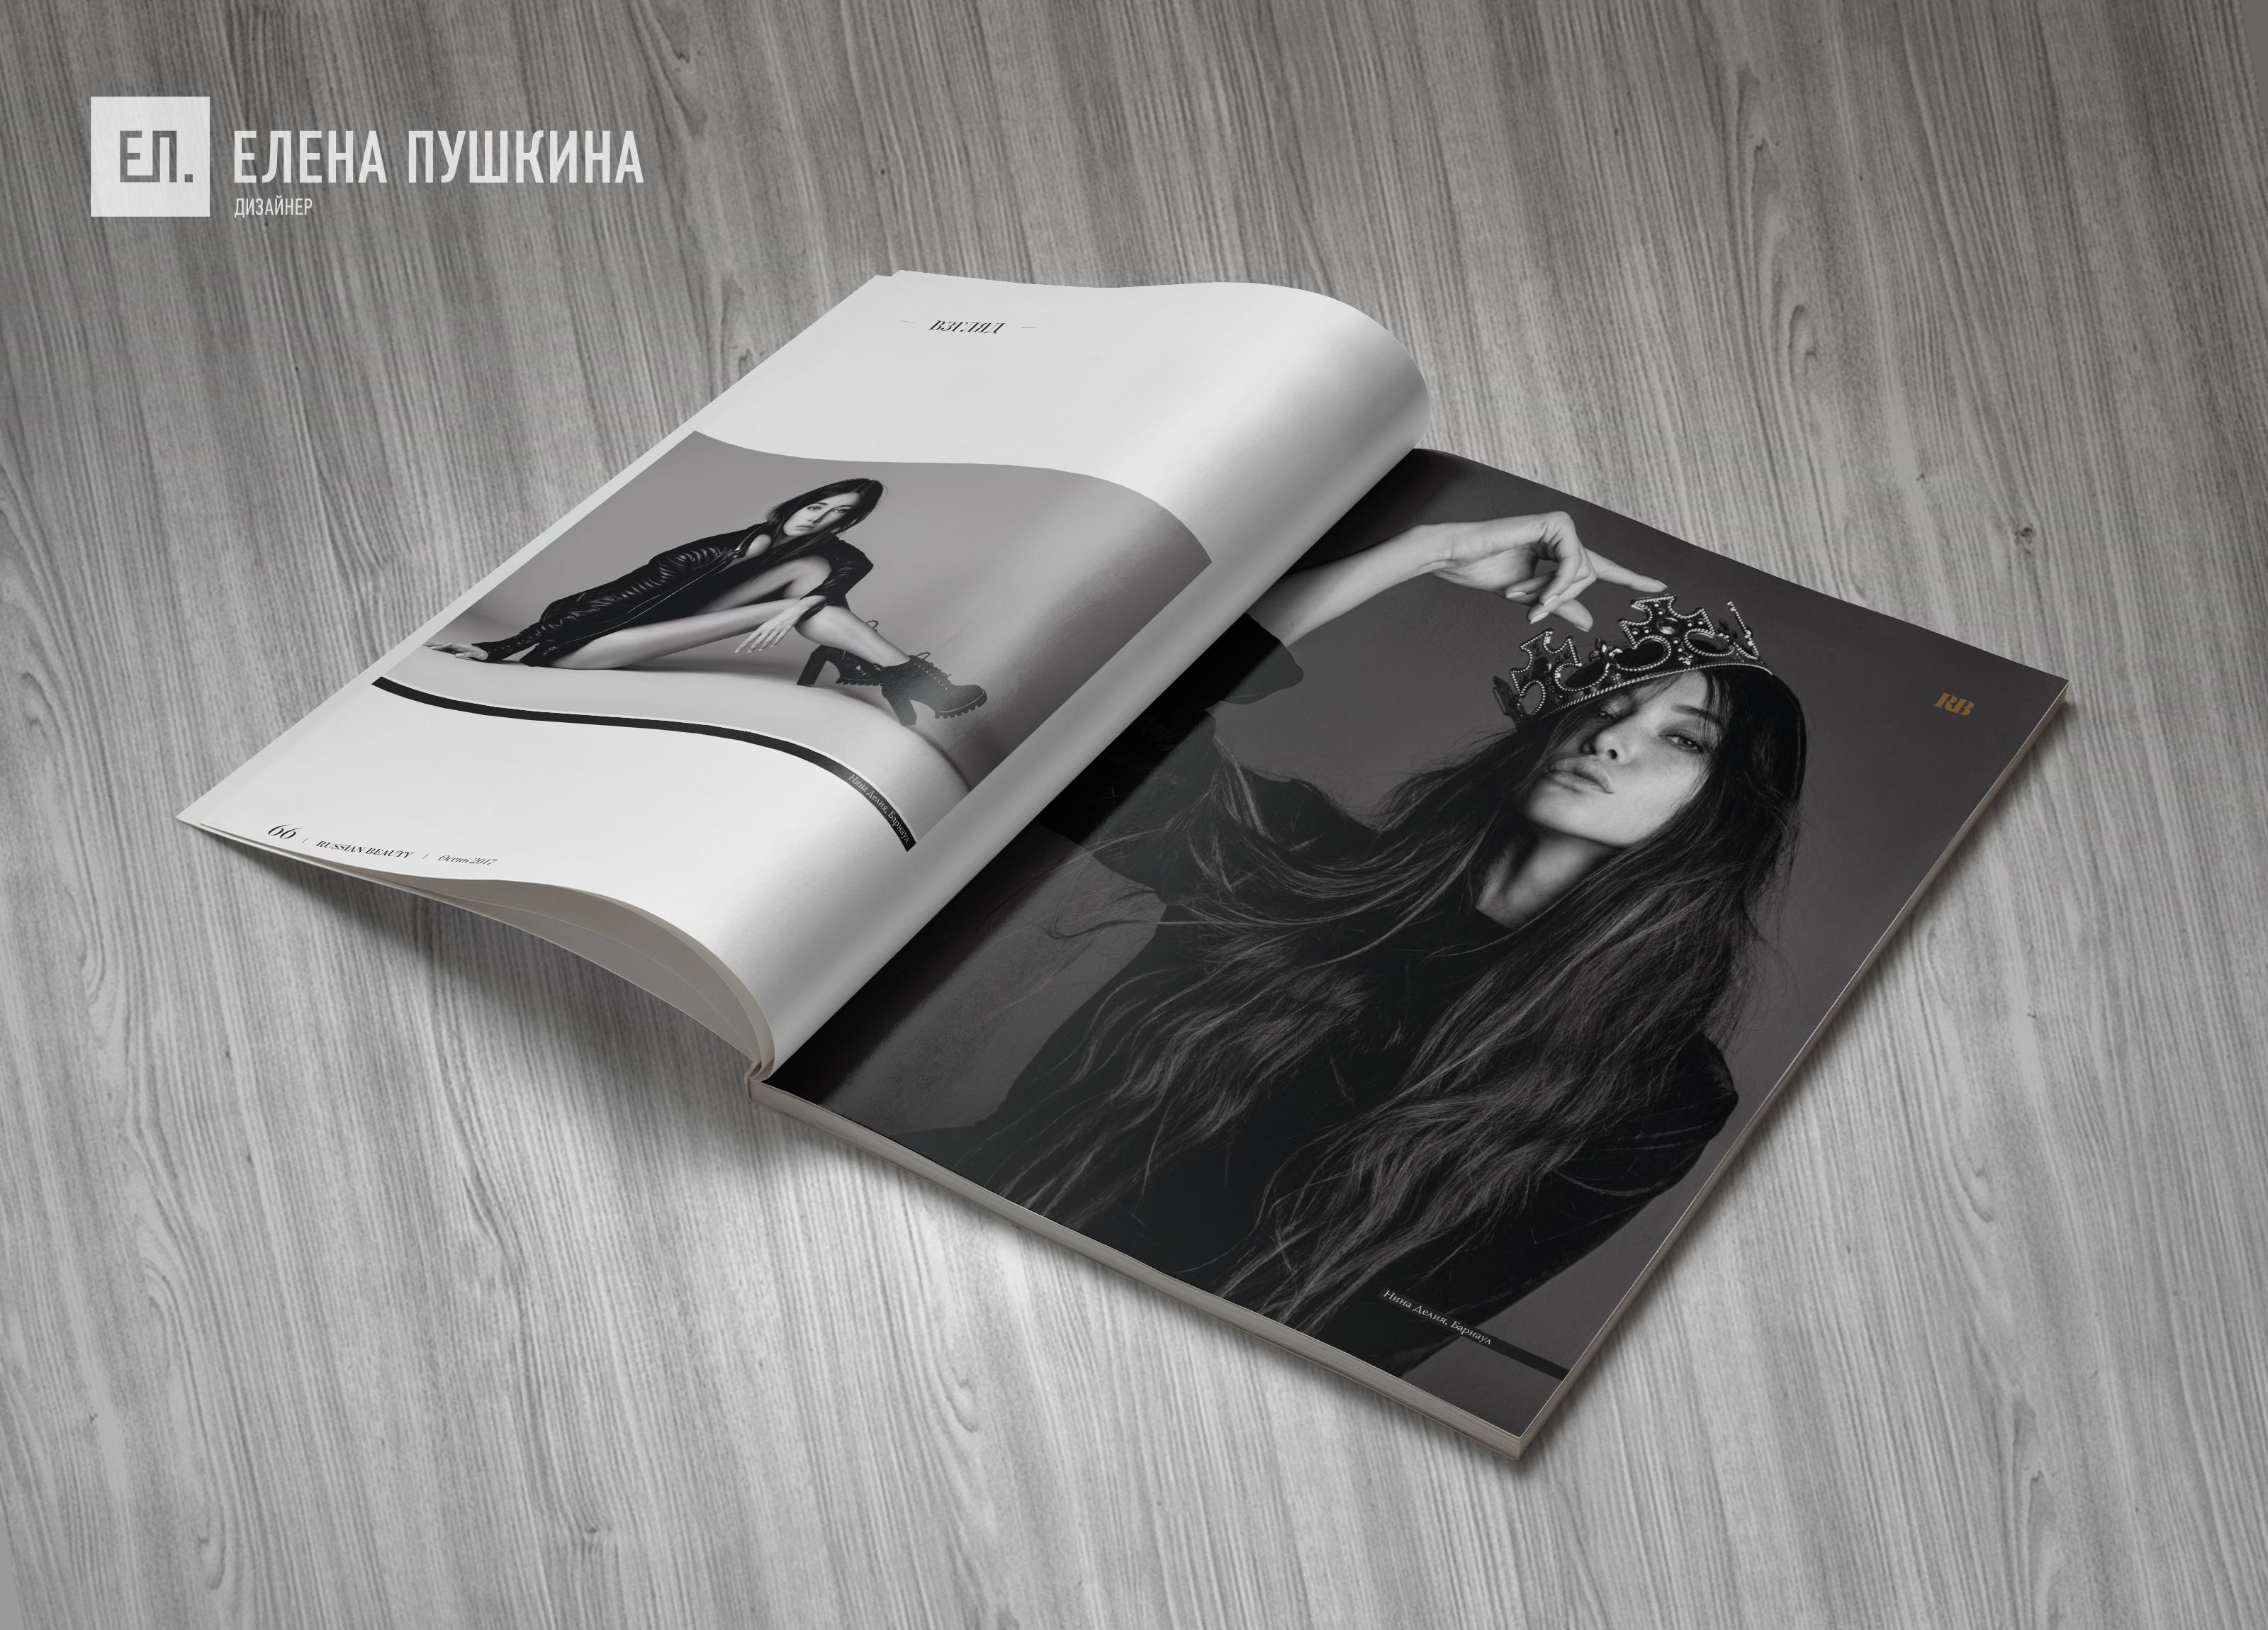 Глянцевый журнал «RUSSIAN BEAUTY» №1 январь 2018— разработка с«нуля» логотипа, обложки, макета ивёрстка журнала Разработка журналов Портфолио